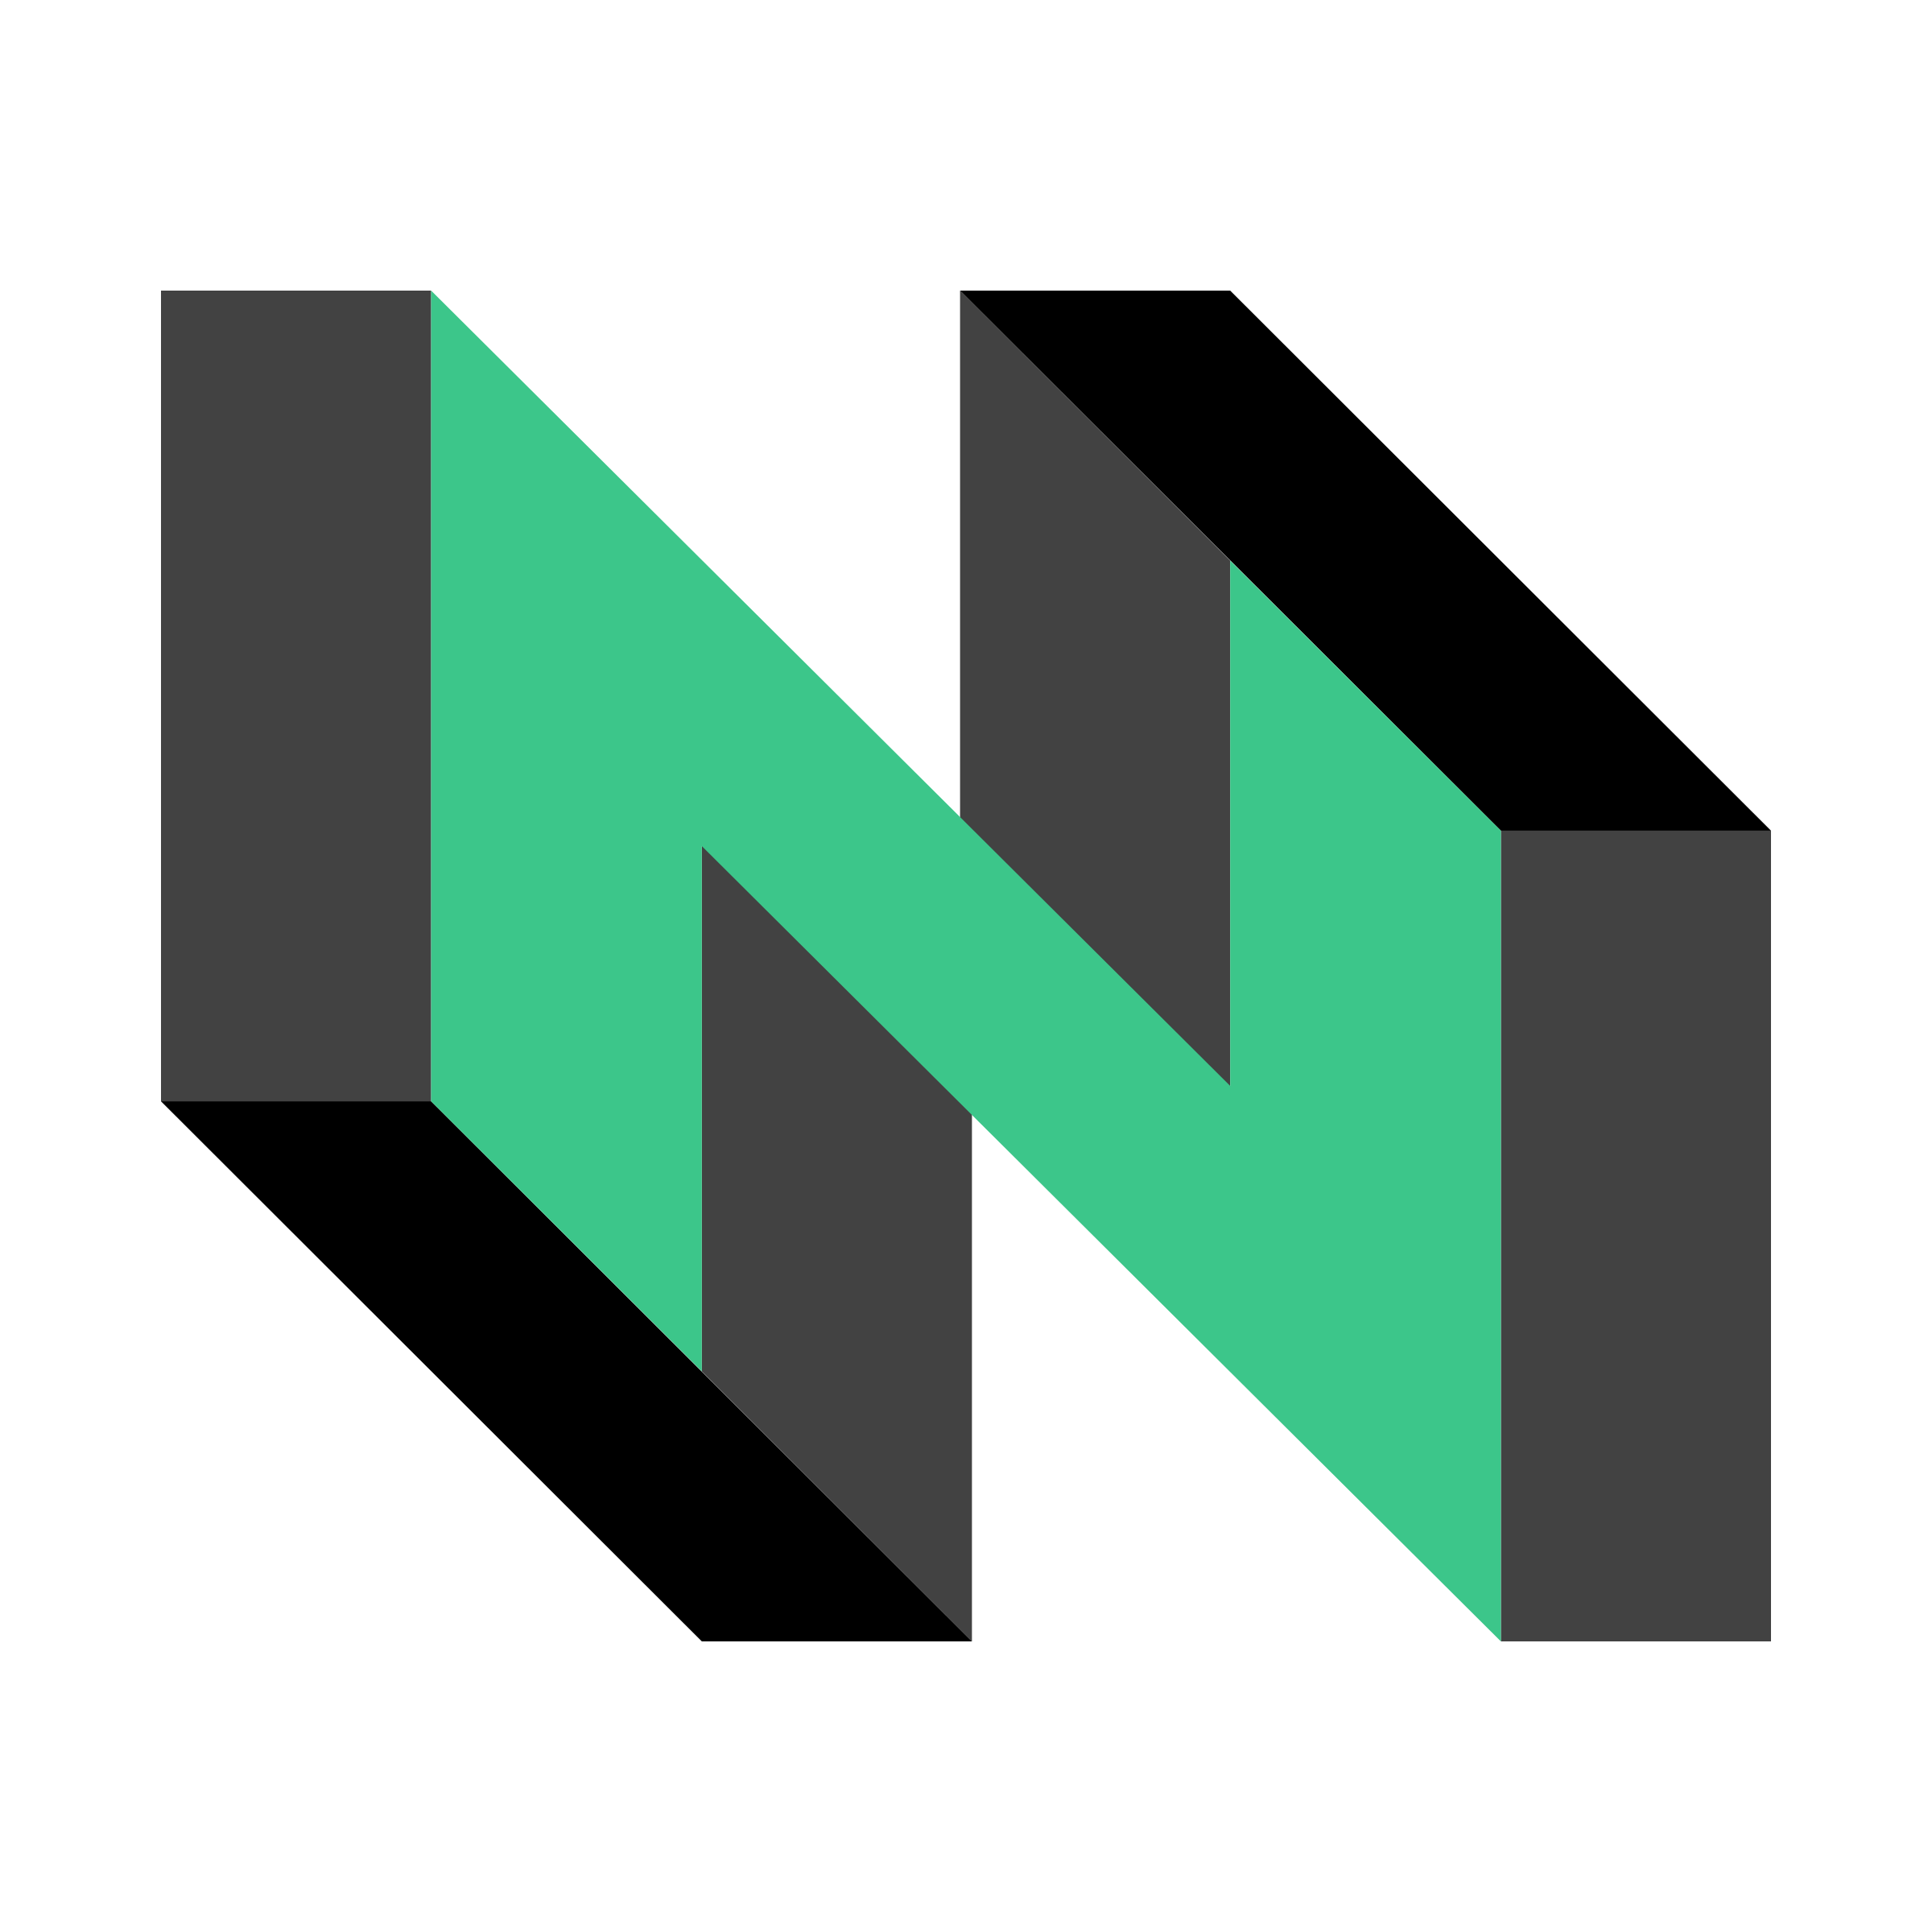 Nervos CKB Mining - Cryptocurrency Logo